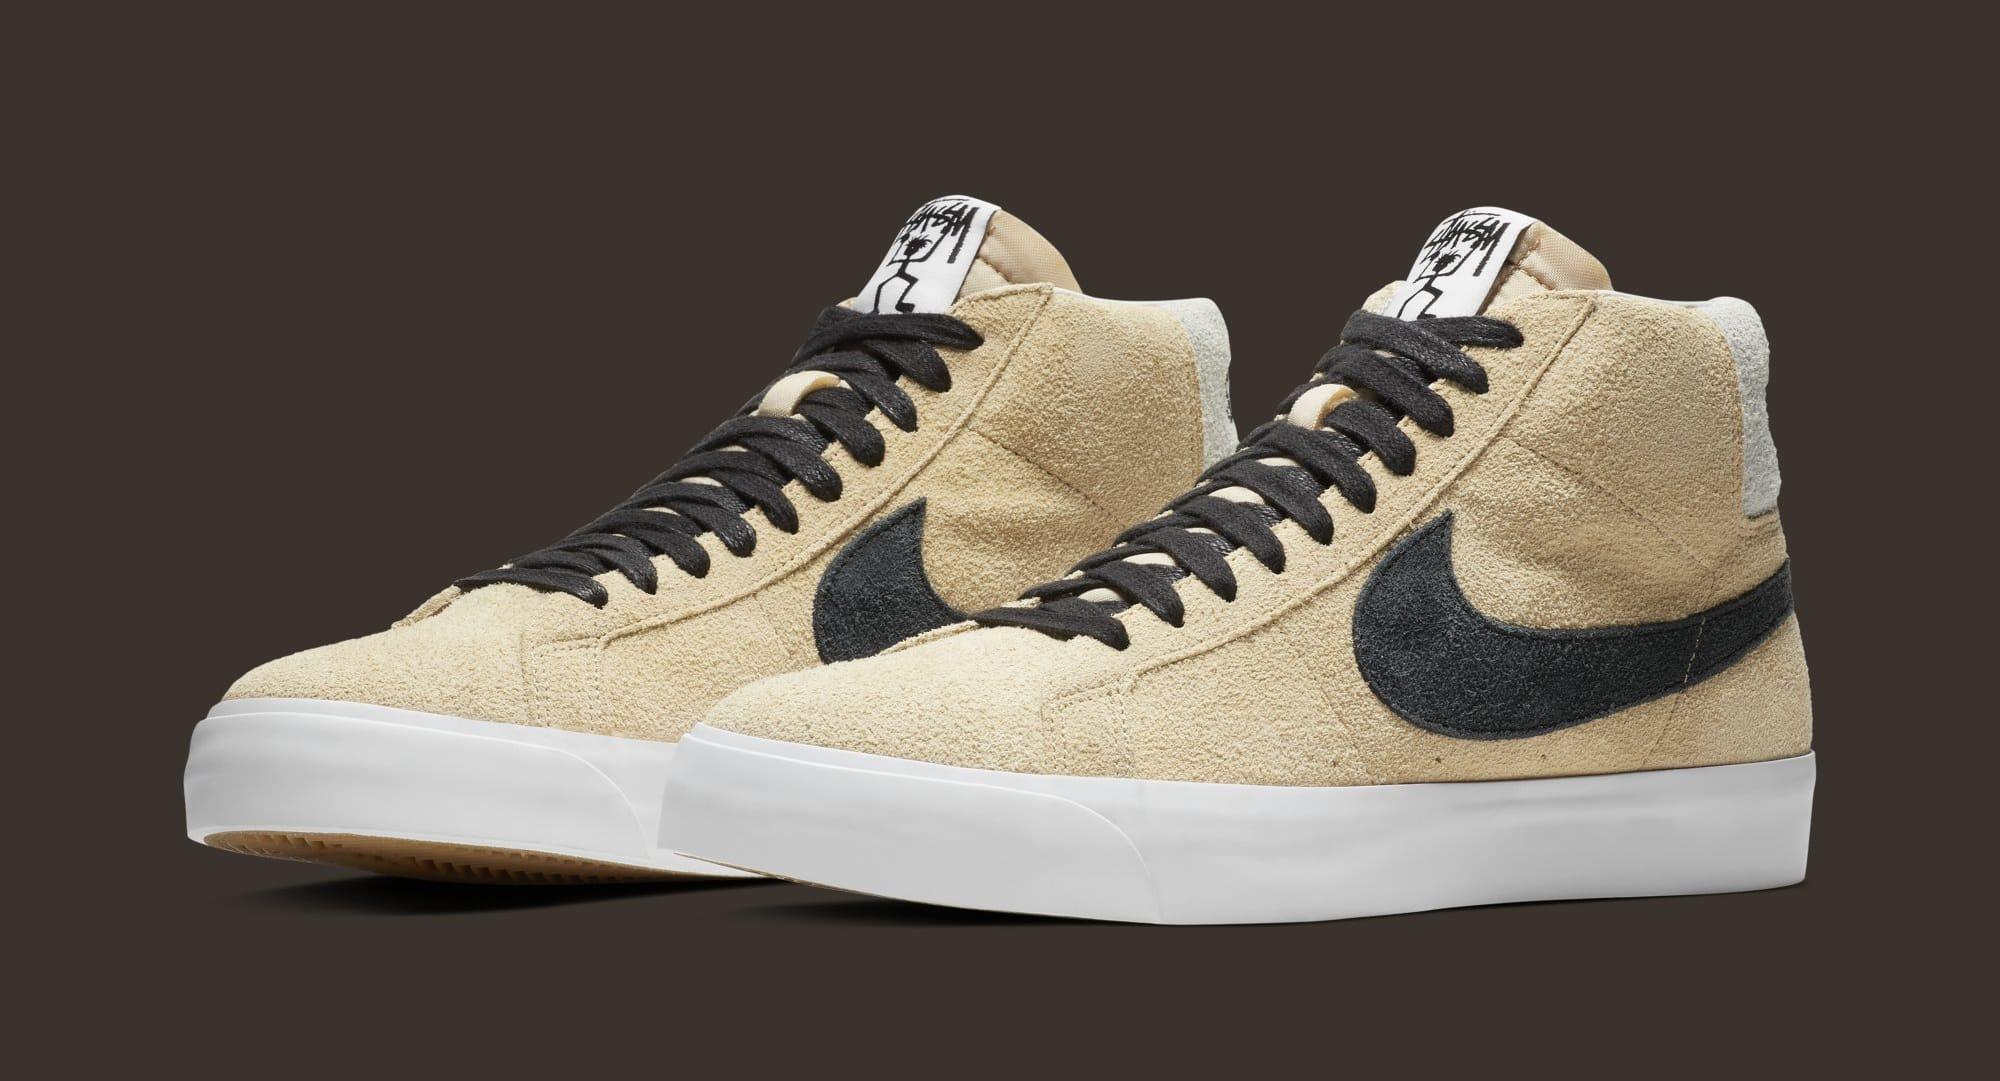 Picasso ellos Sin cabeza  Stüssy x Nike SB Blazer Mid/Low Release Date | Sole Collector